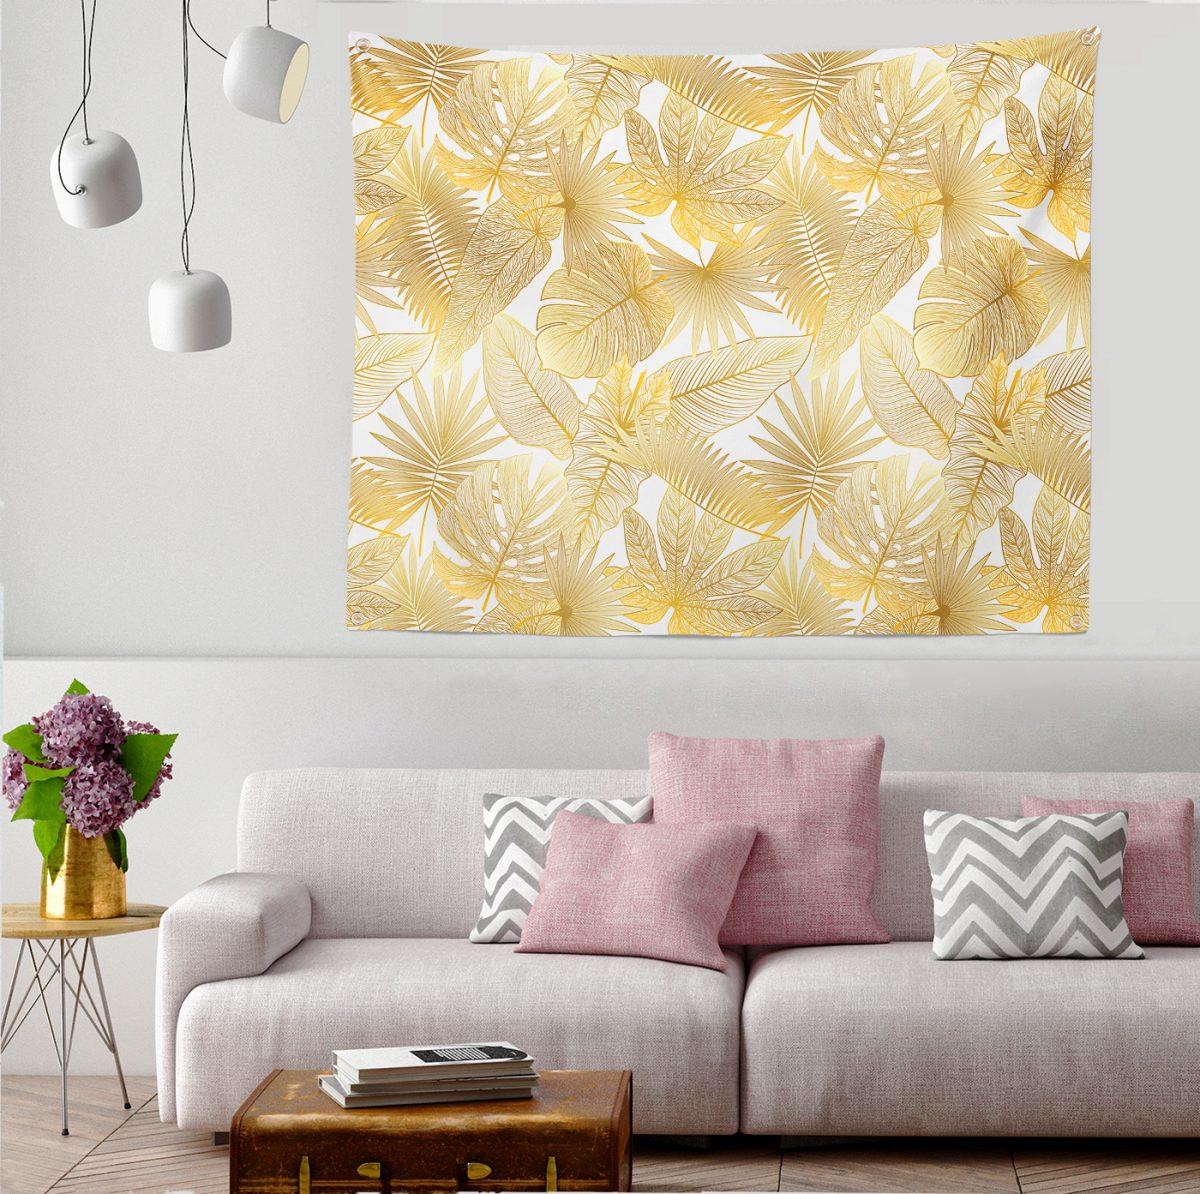 Vizon Renk Amazon Yaprakları Temalı Modern Tapestry Duvar Örtüsü Realhomes